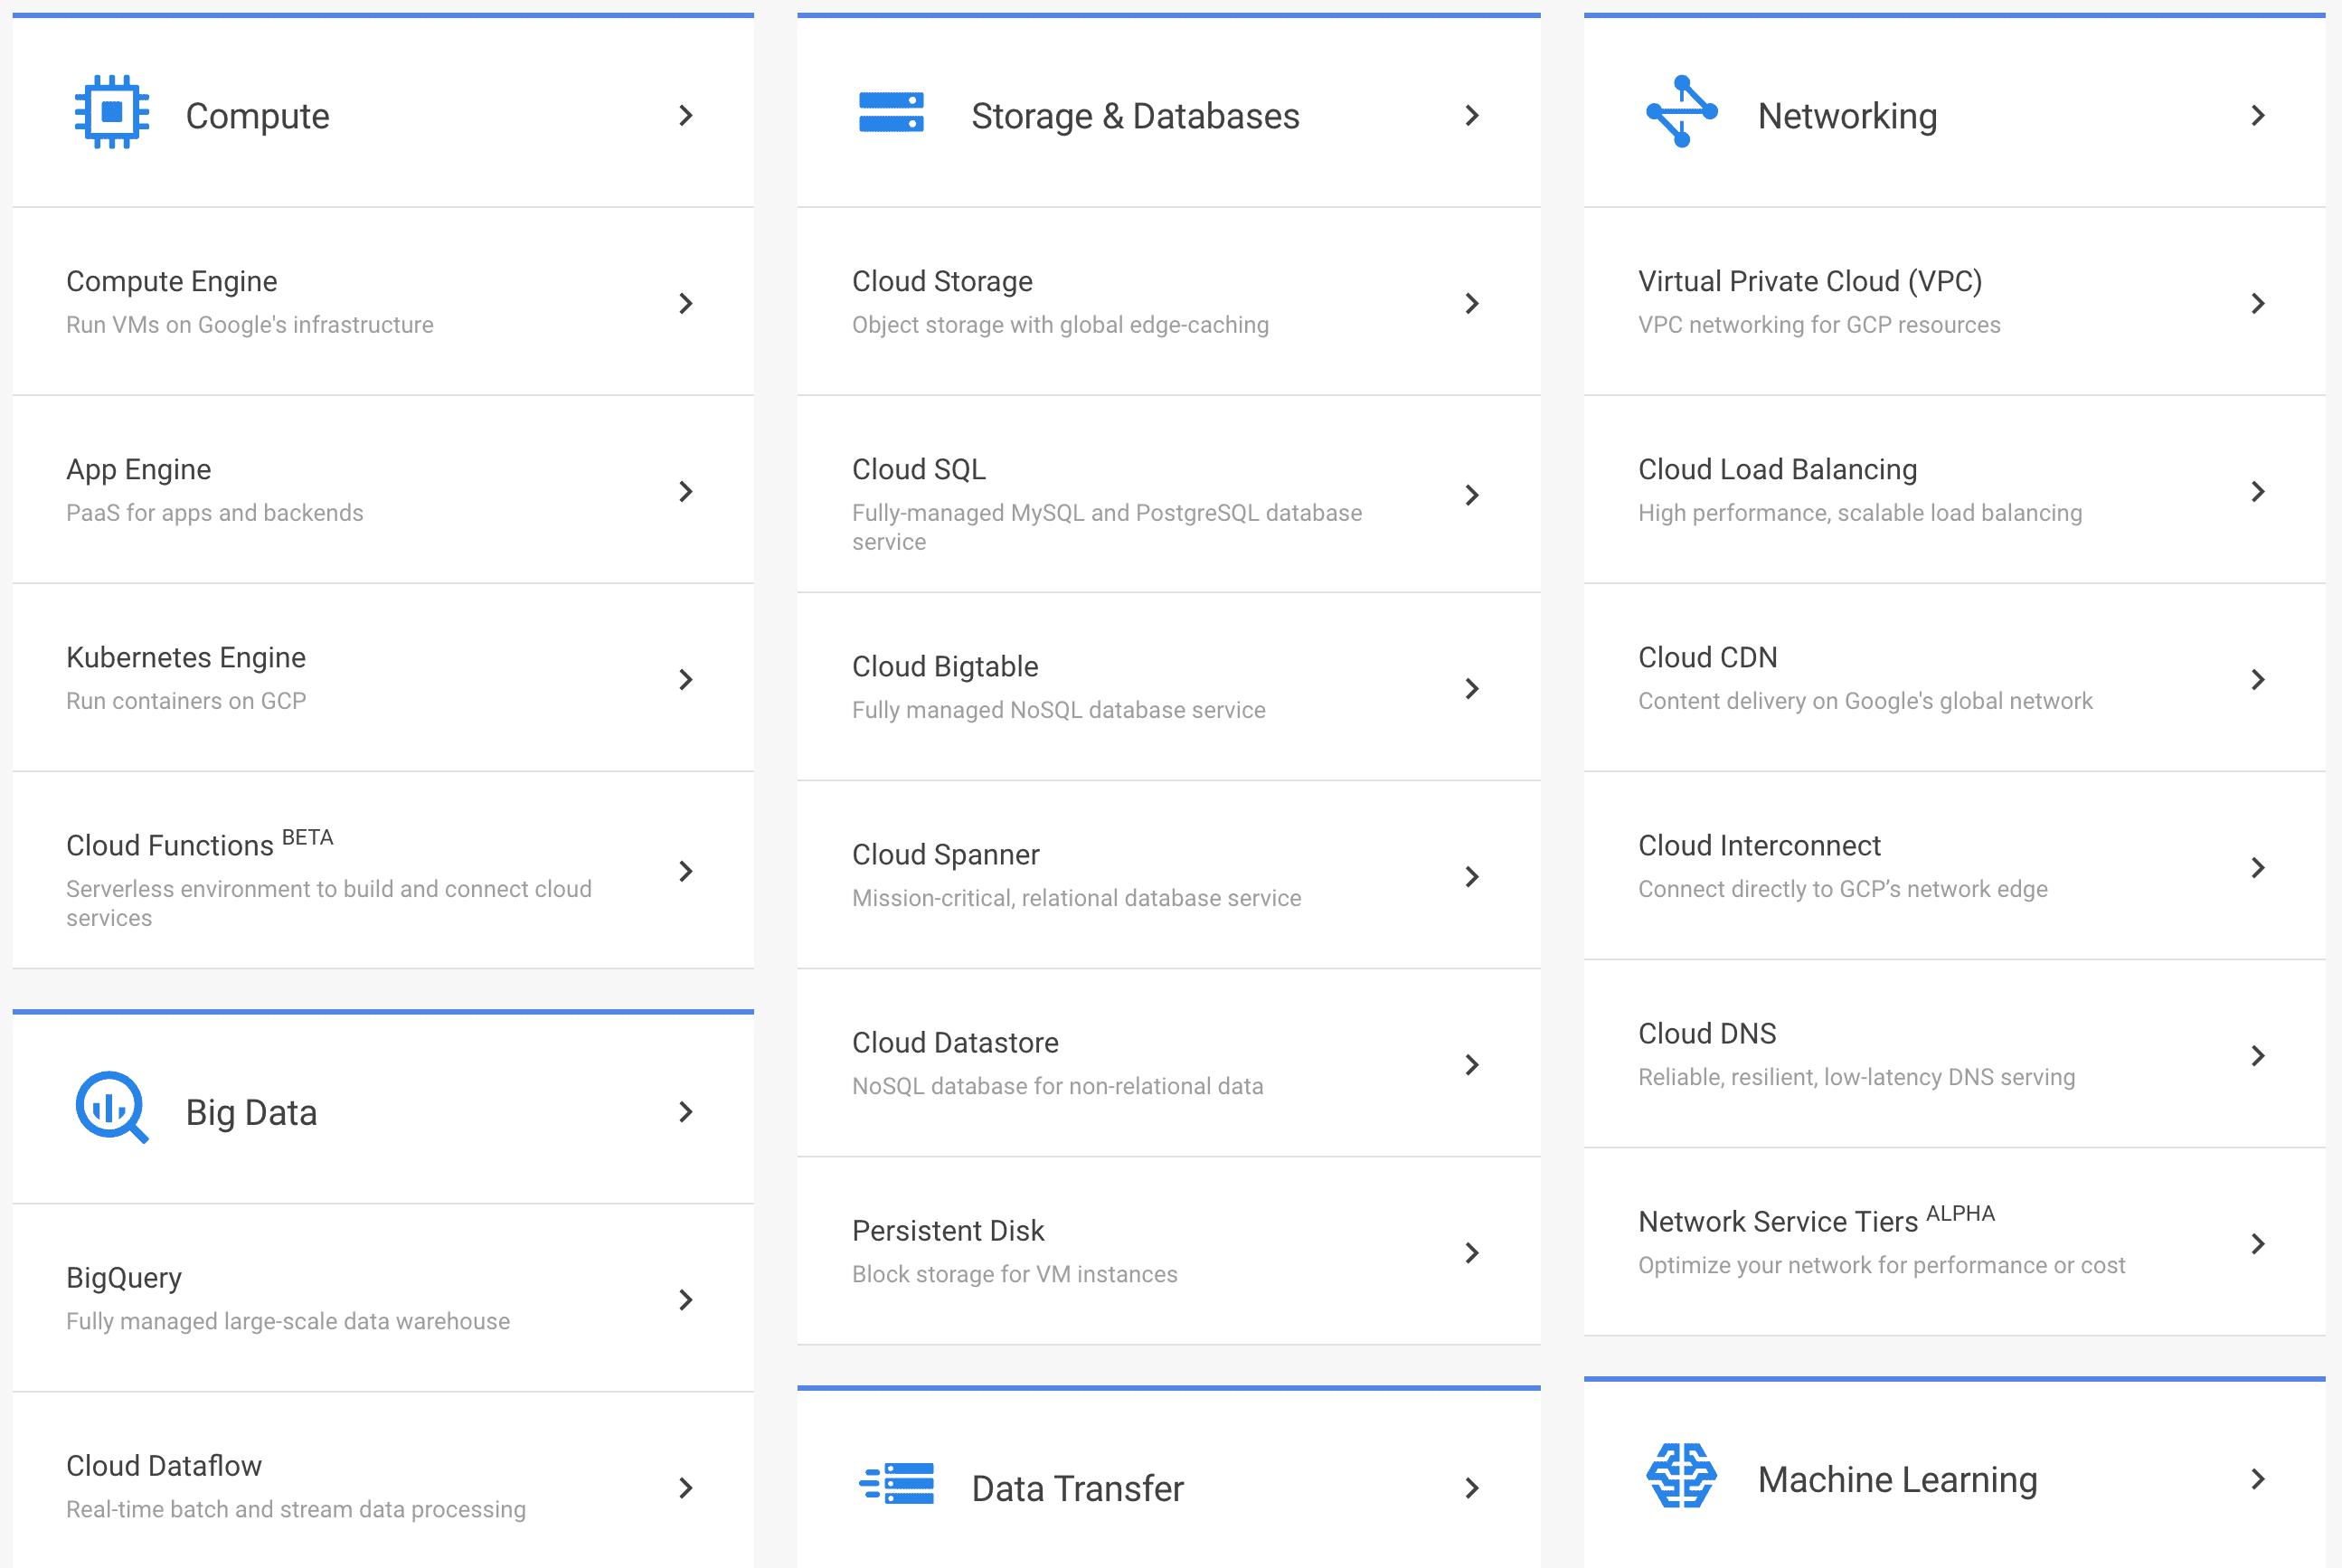 GCP Features / Services